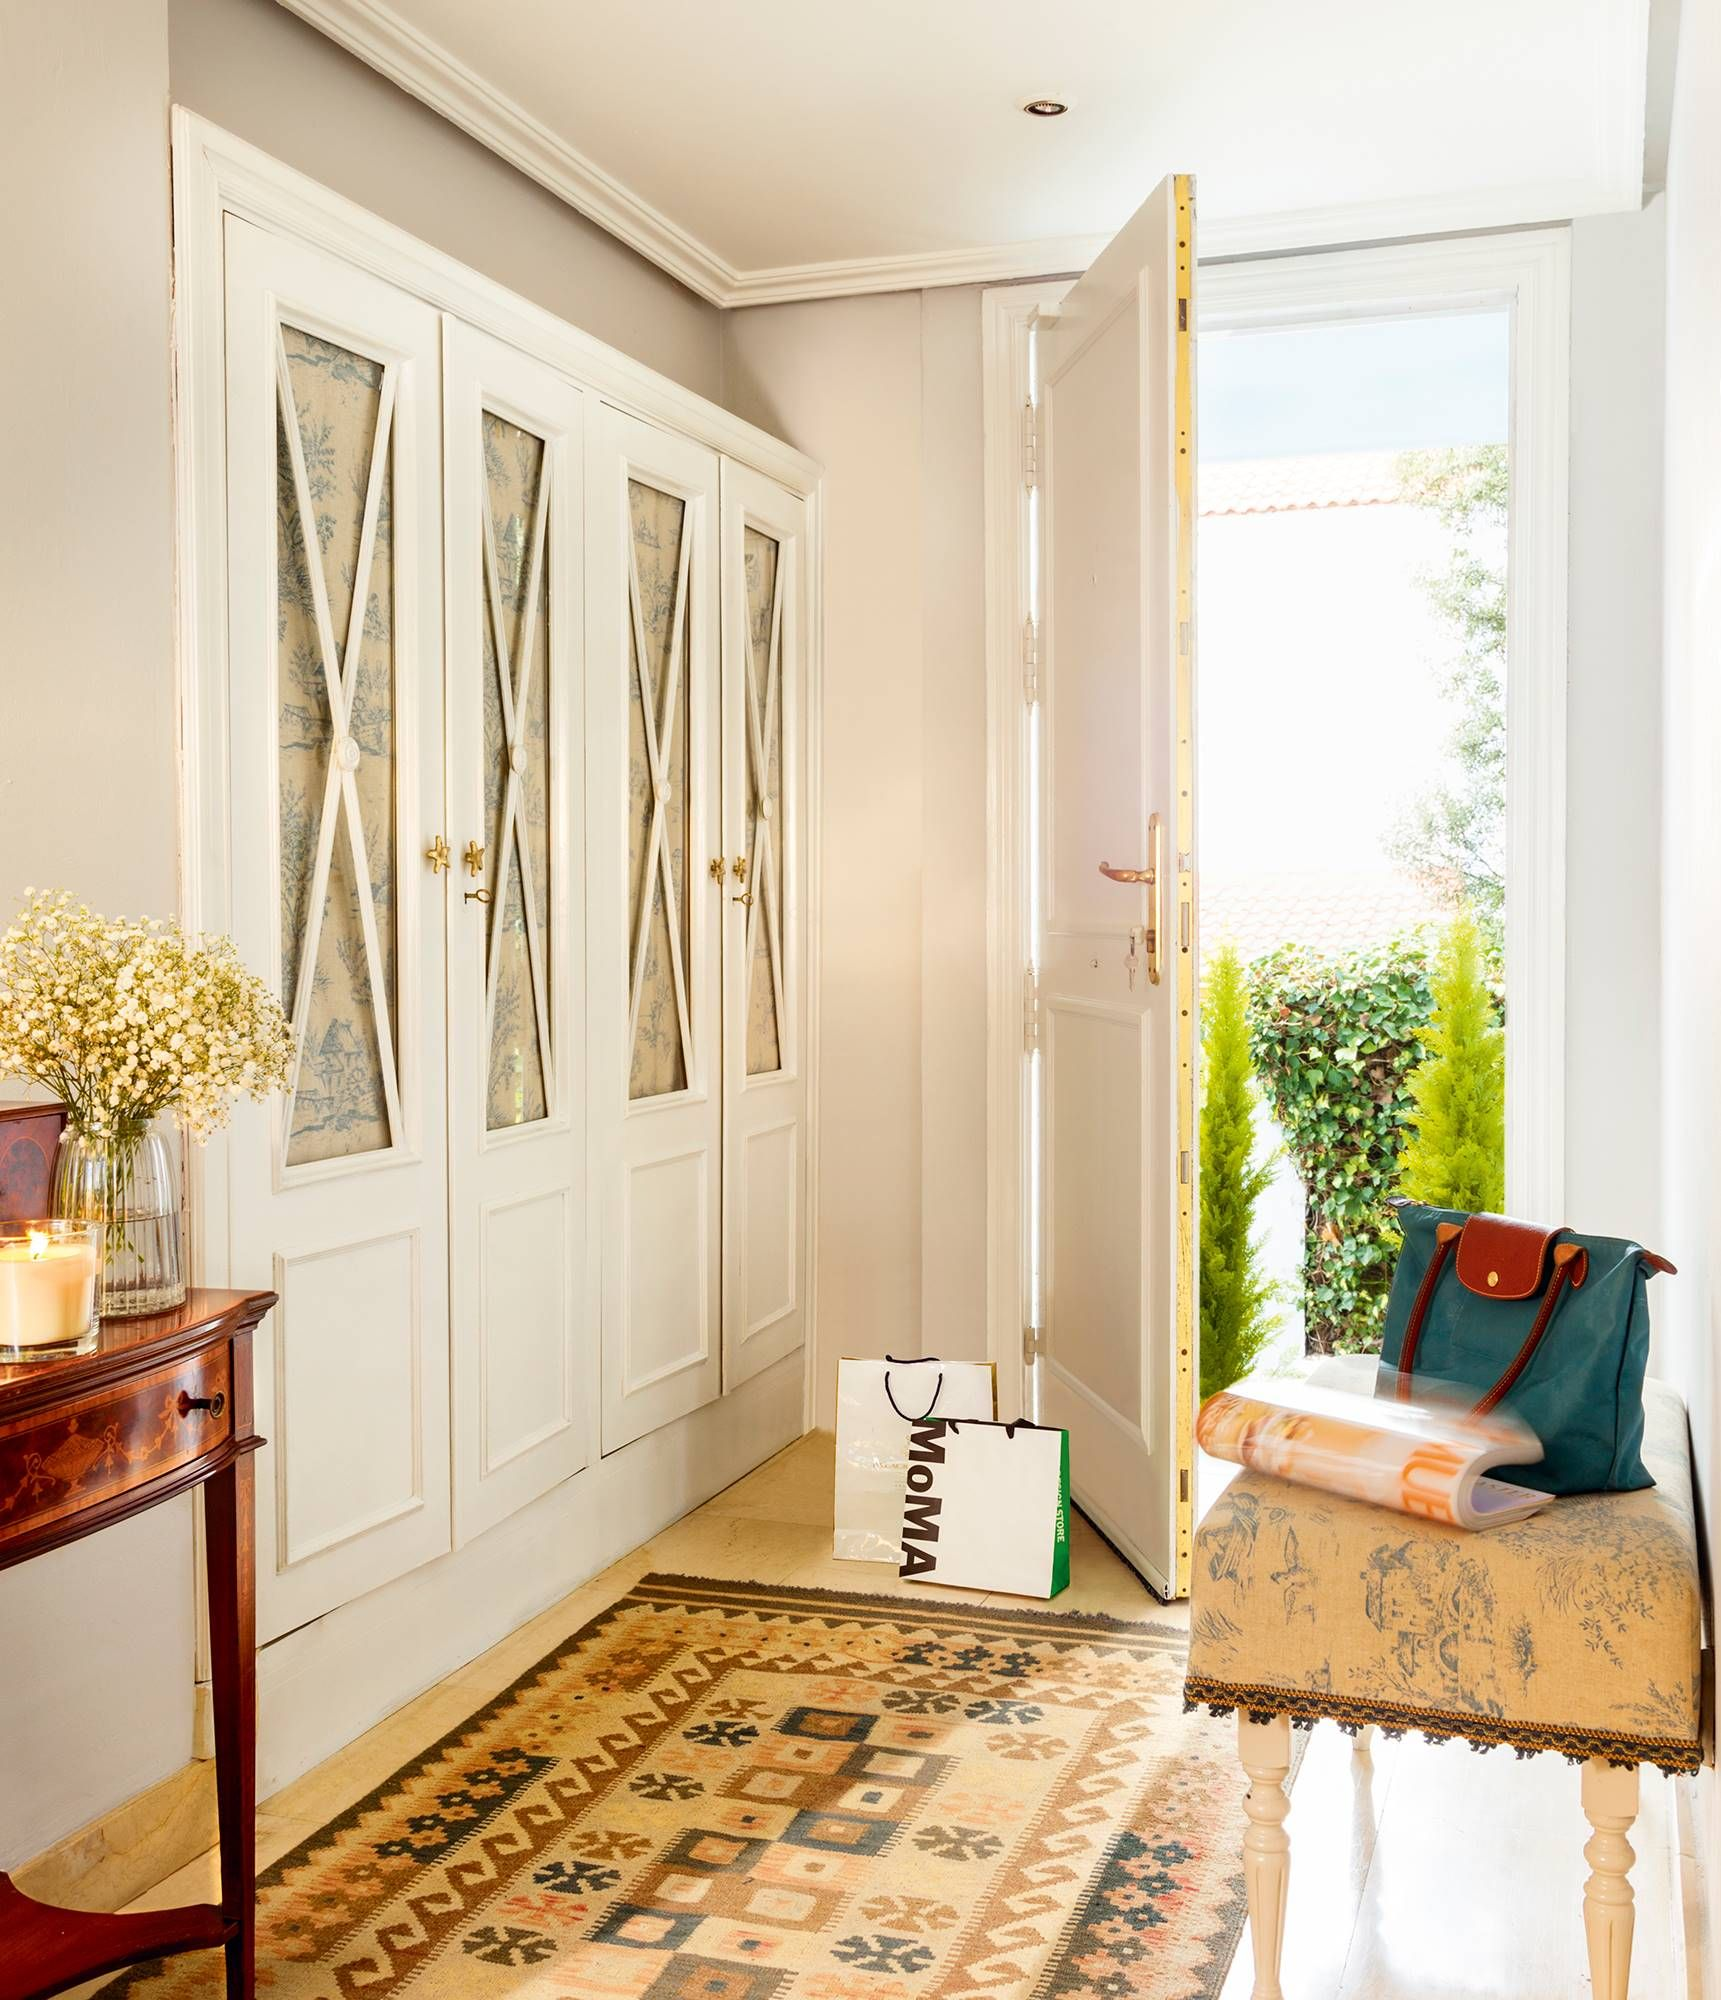 Refuerza las puertas en 2019 armarios de dise o for Armario de pared con entrada equipada